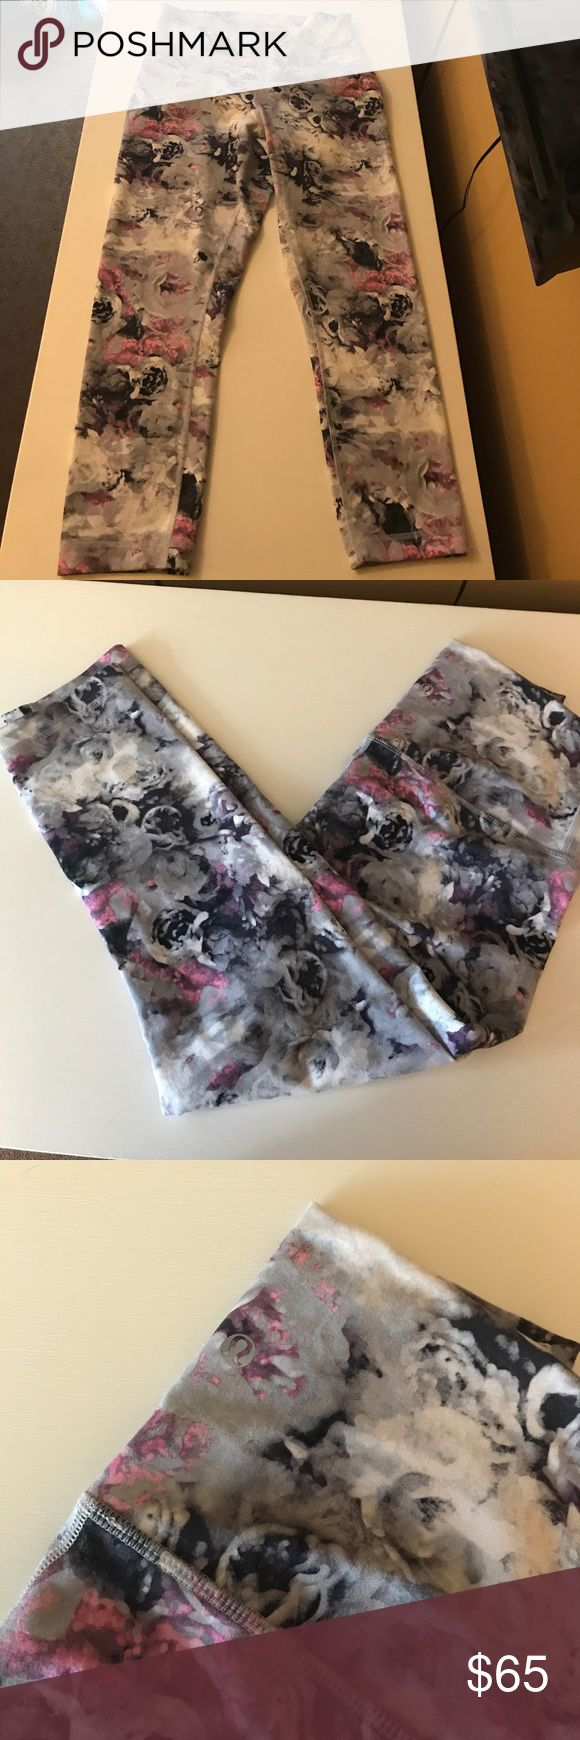 Lululemon crop legging multi color flower print Lululemon high rise crop legging pink/gray/white/black  flower pattern print similar to— https://shop.lululemon.com/p/women-crops/Wunder-Under-Hi-Rise-Half-Tight/_/prod8555494?color=30553 lululemon athletica Pants Leggings